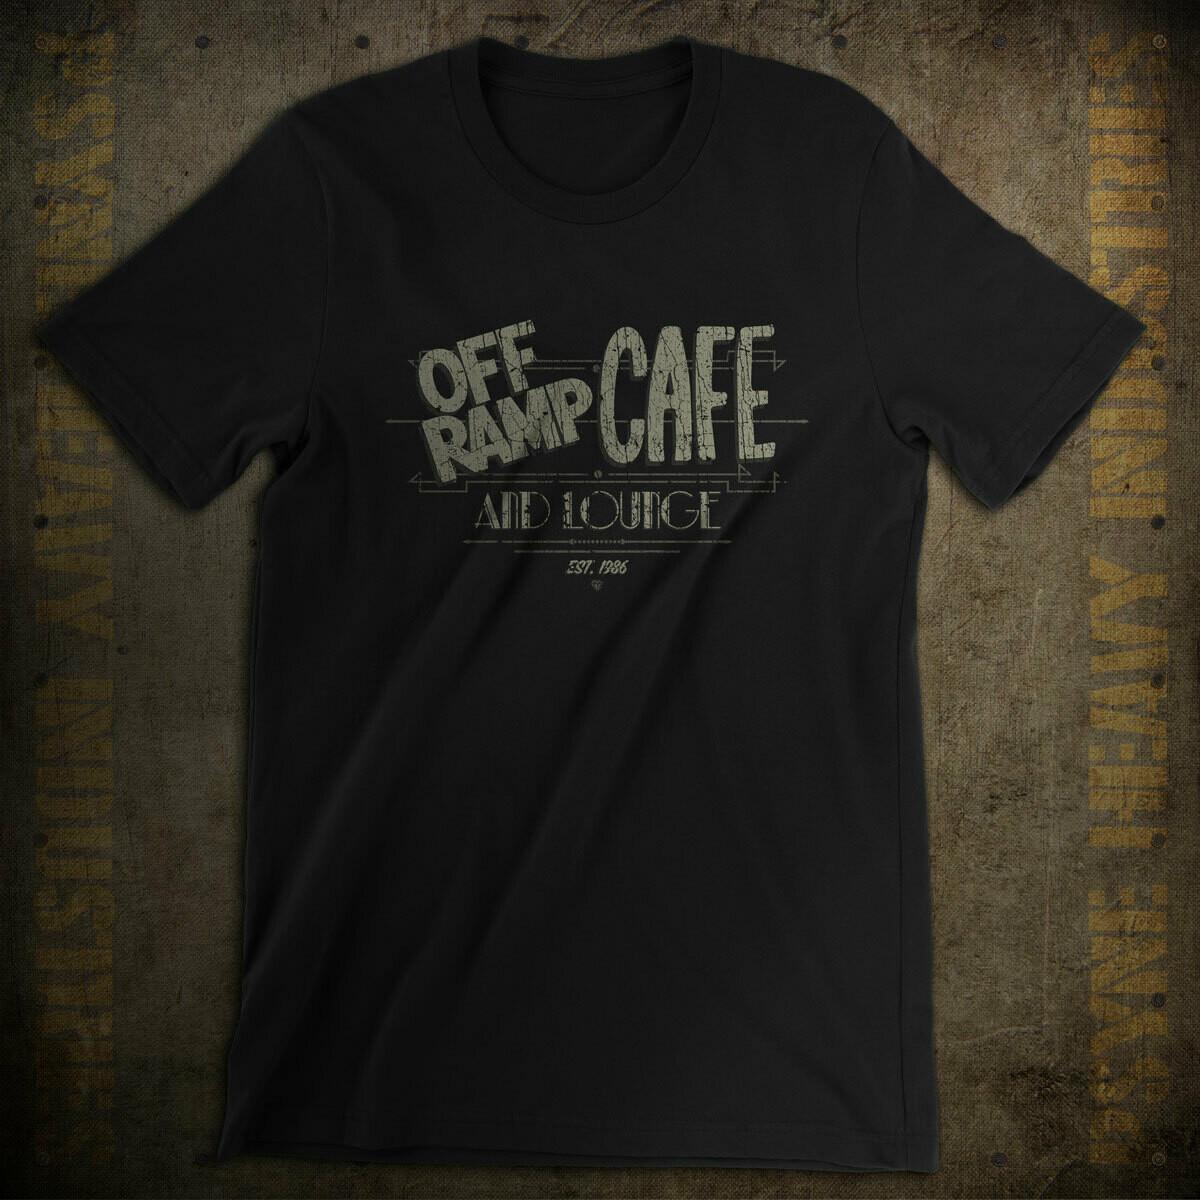 Off Ramp Cafe Seattle Vintage T-Shirt